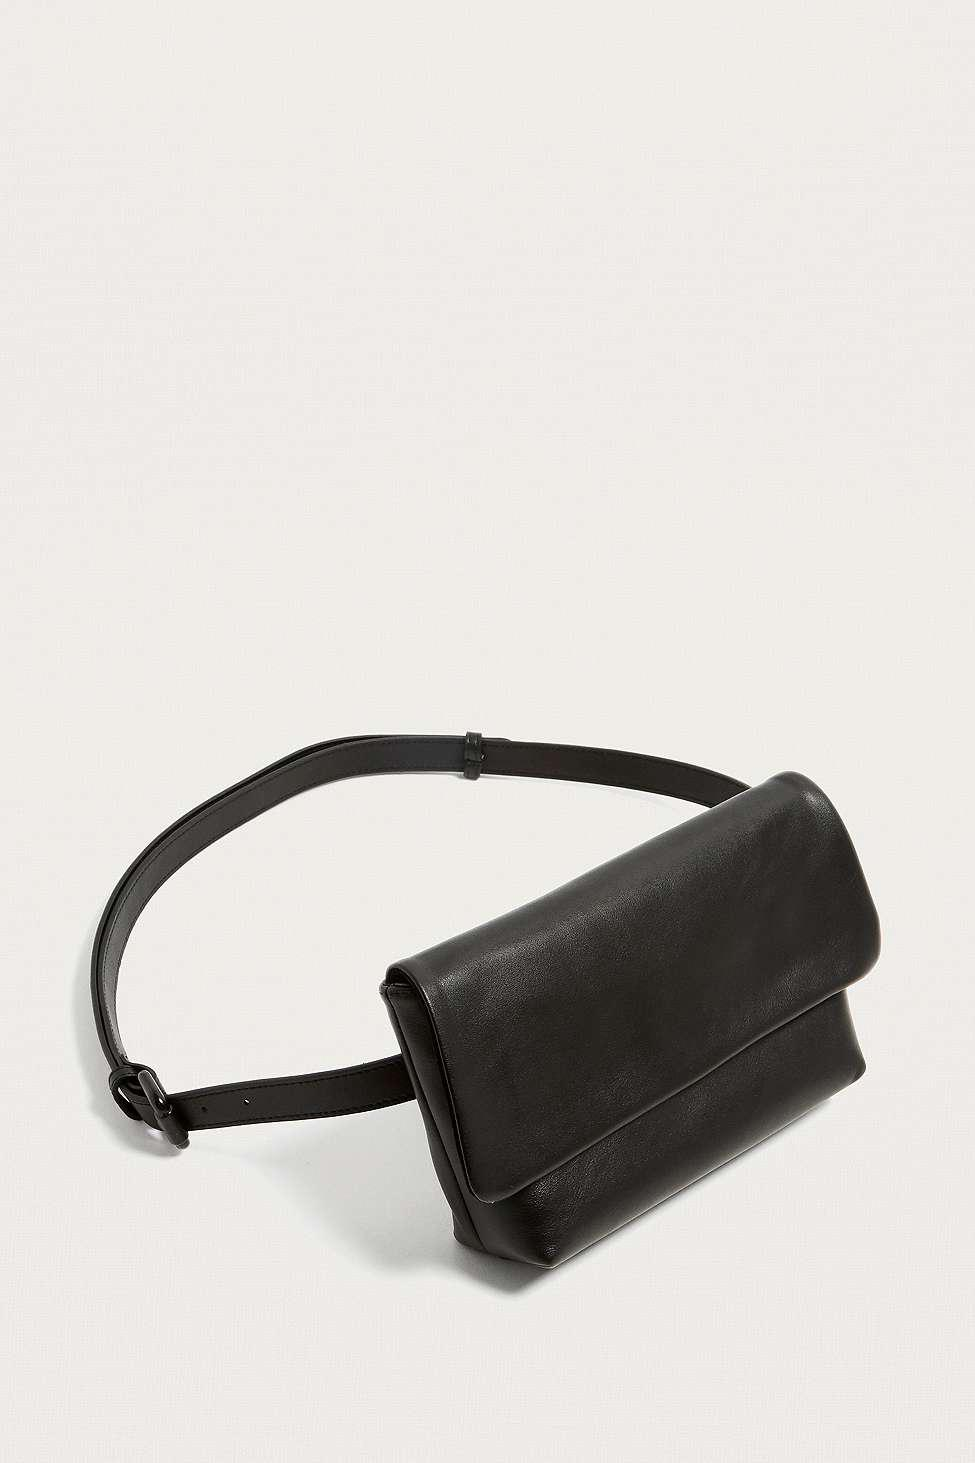 f36062004640f Vagabond Copenhagen Black Leather Bum Bag - Womens All in Black - Lyst